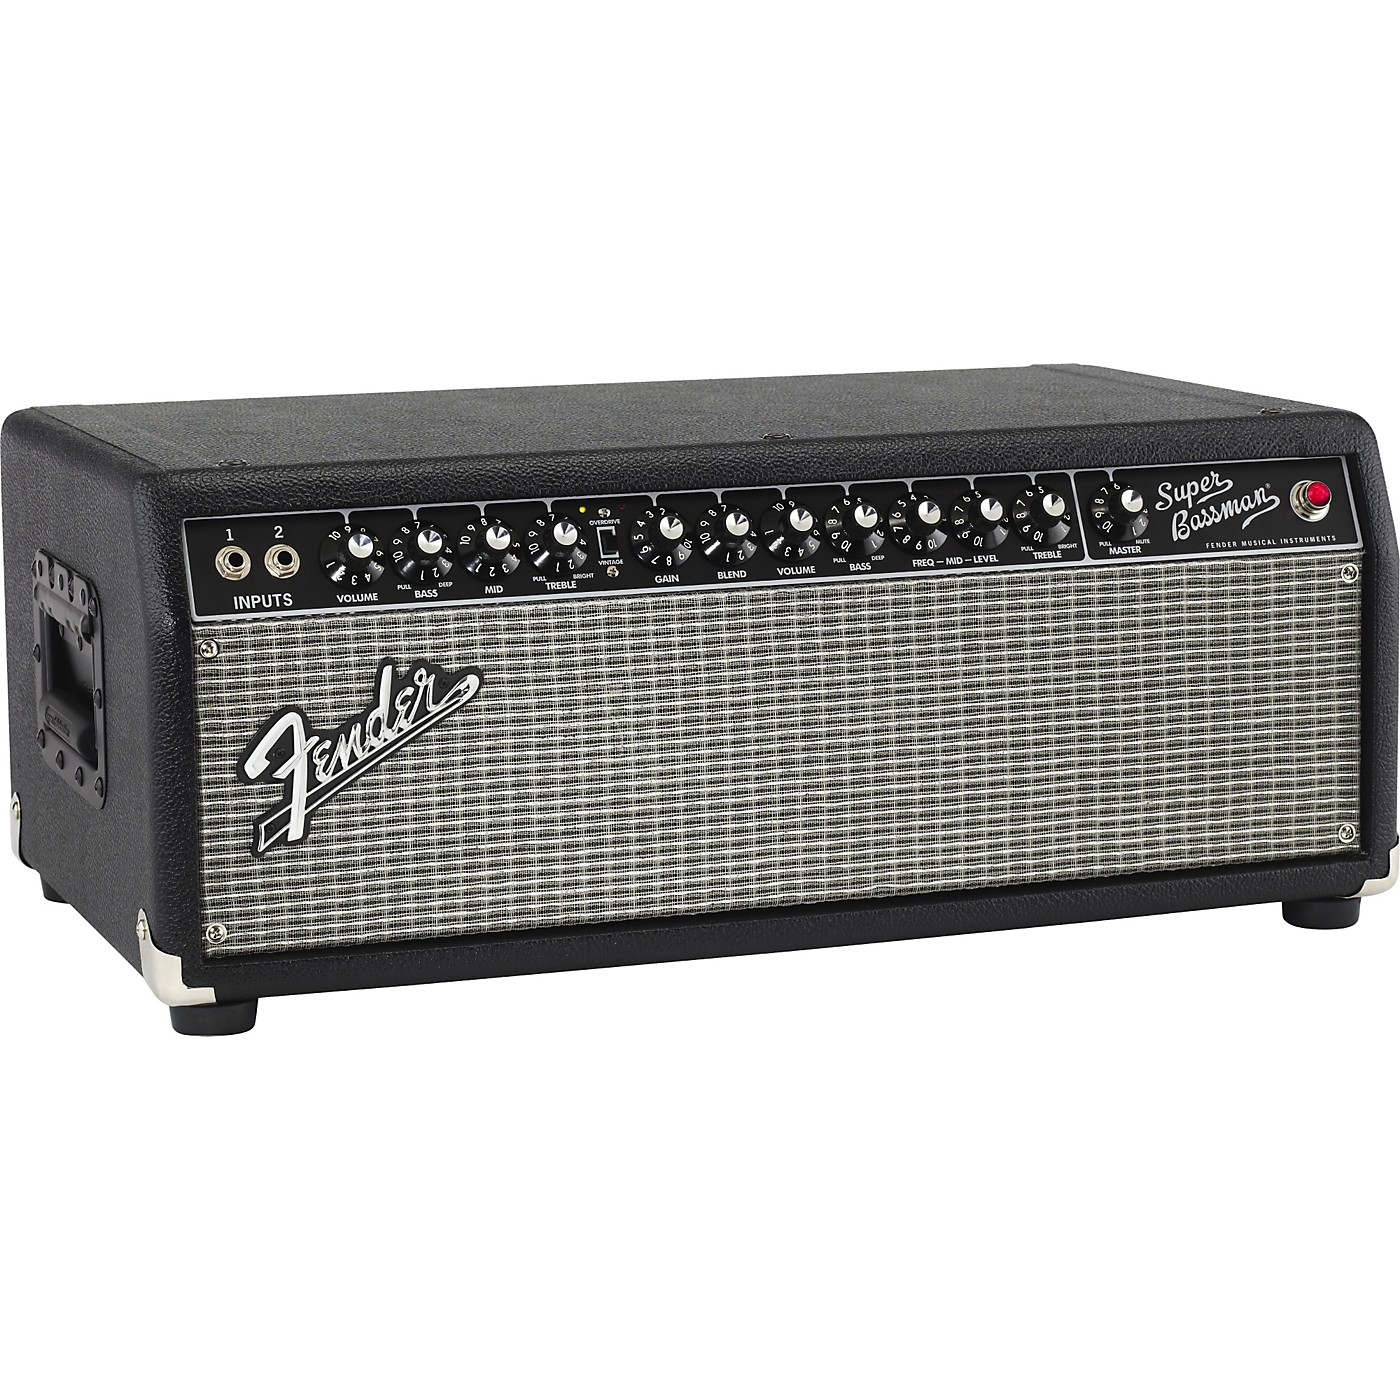 Fender Super Bassman Pro 300W Tube Bass Amp Head thumbnail